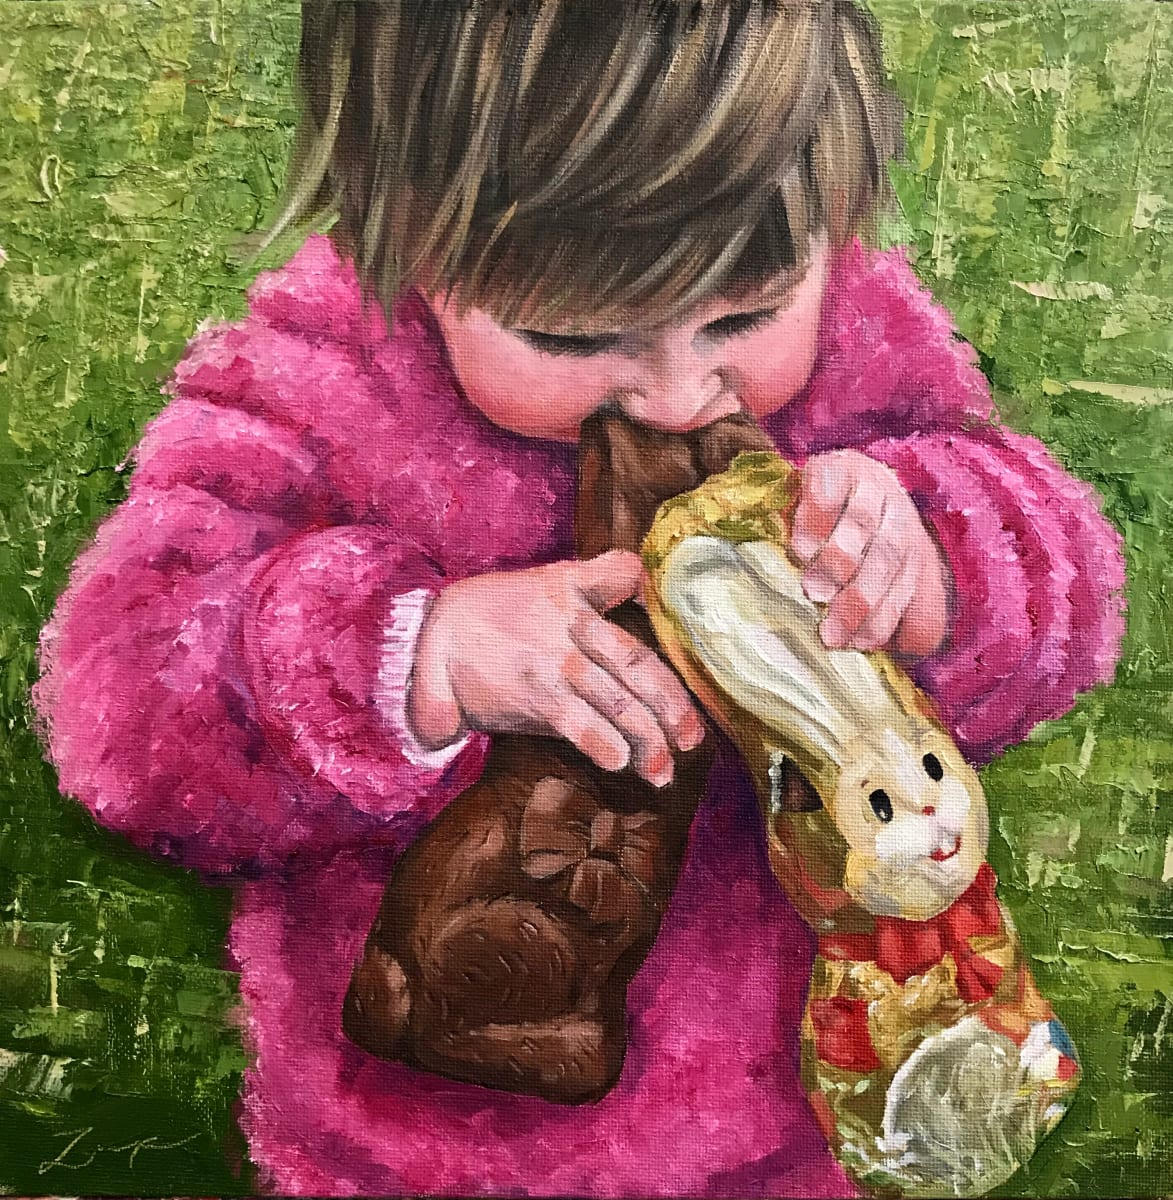 Bunny Binge by Zanya Dahl